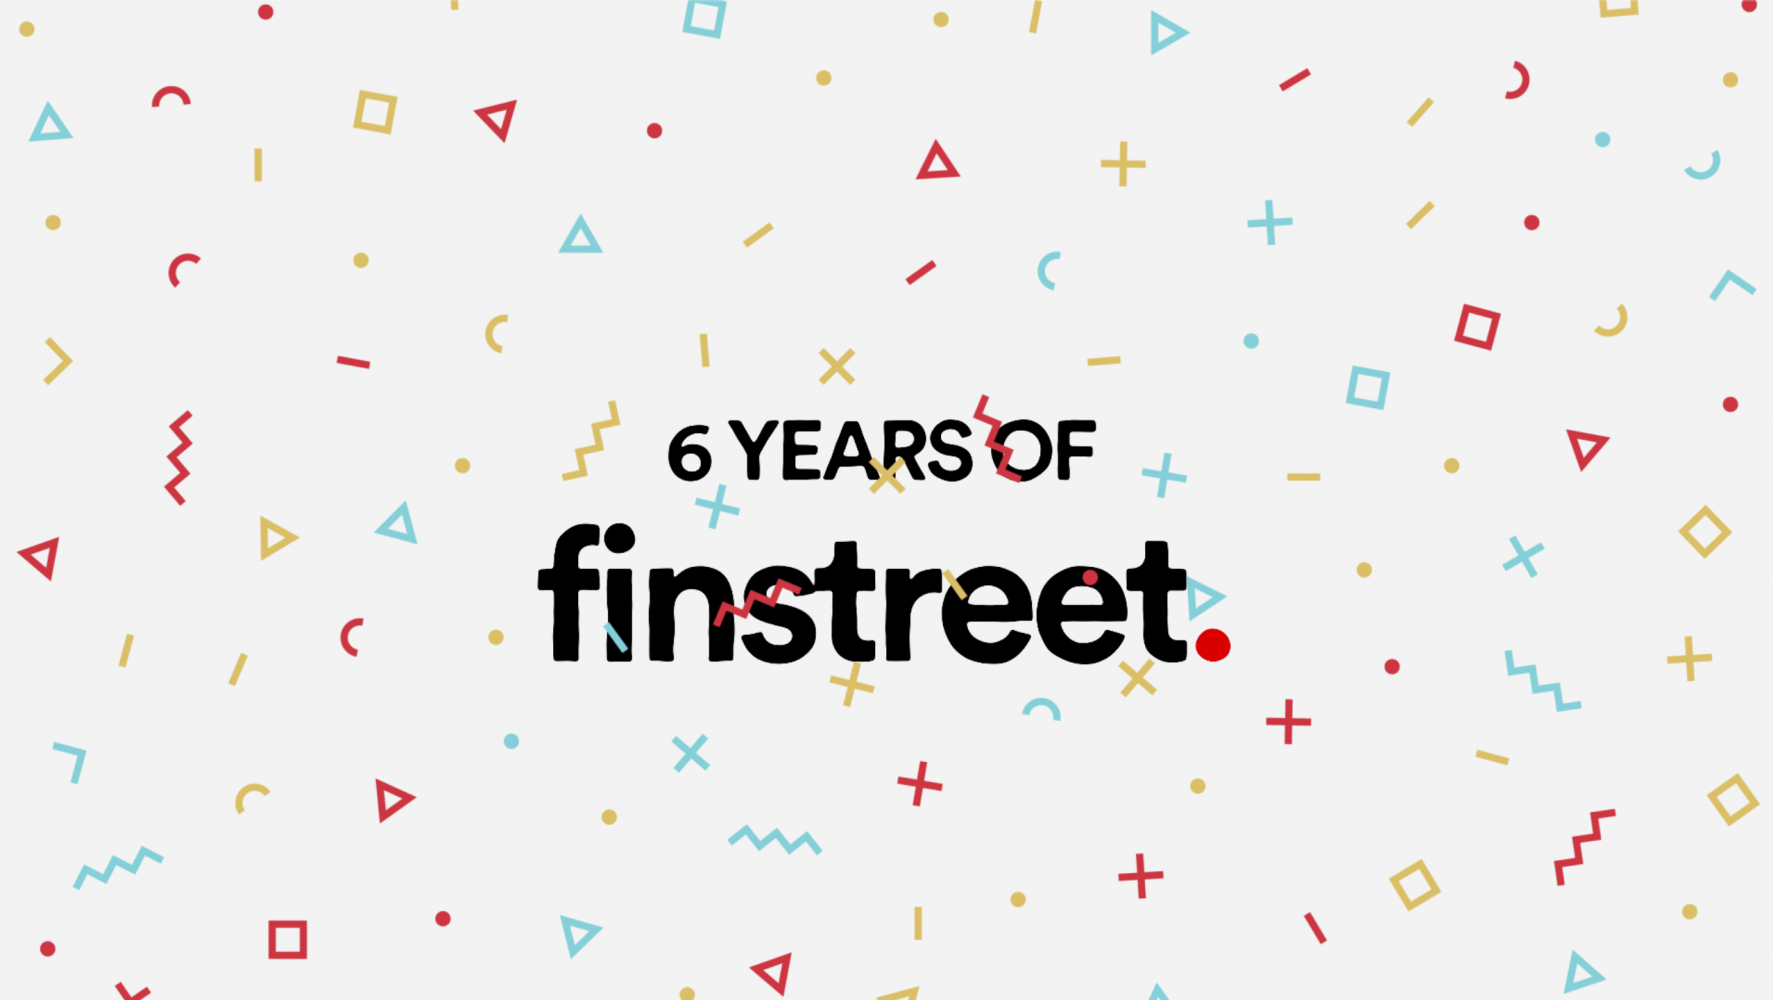 It's our birthday – finstreet wird heute 6 Jahre! #happybirthdaytous 🥳🎂🎉🎈